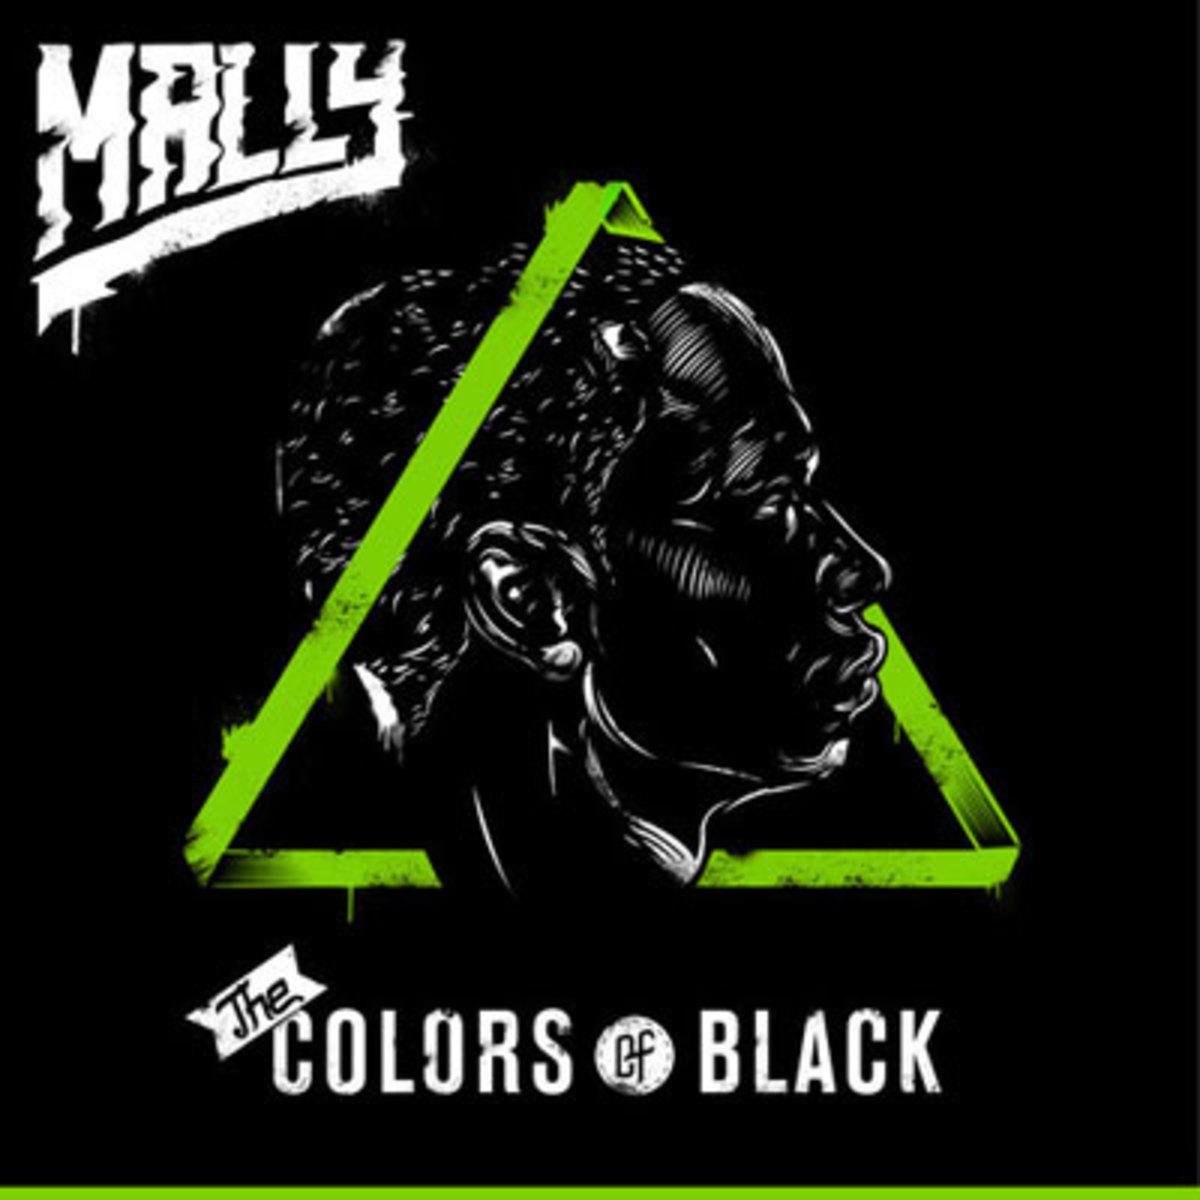 mally-colorsofblack.jpg